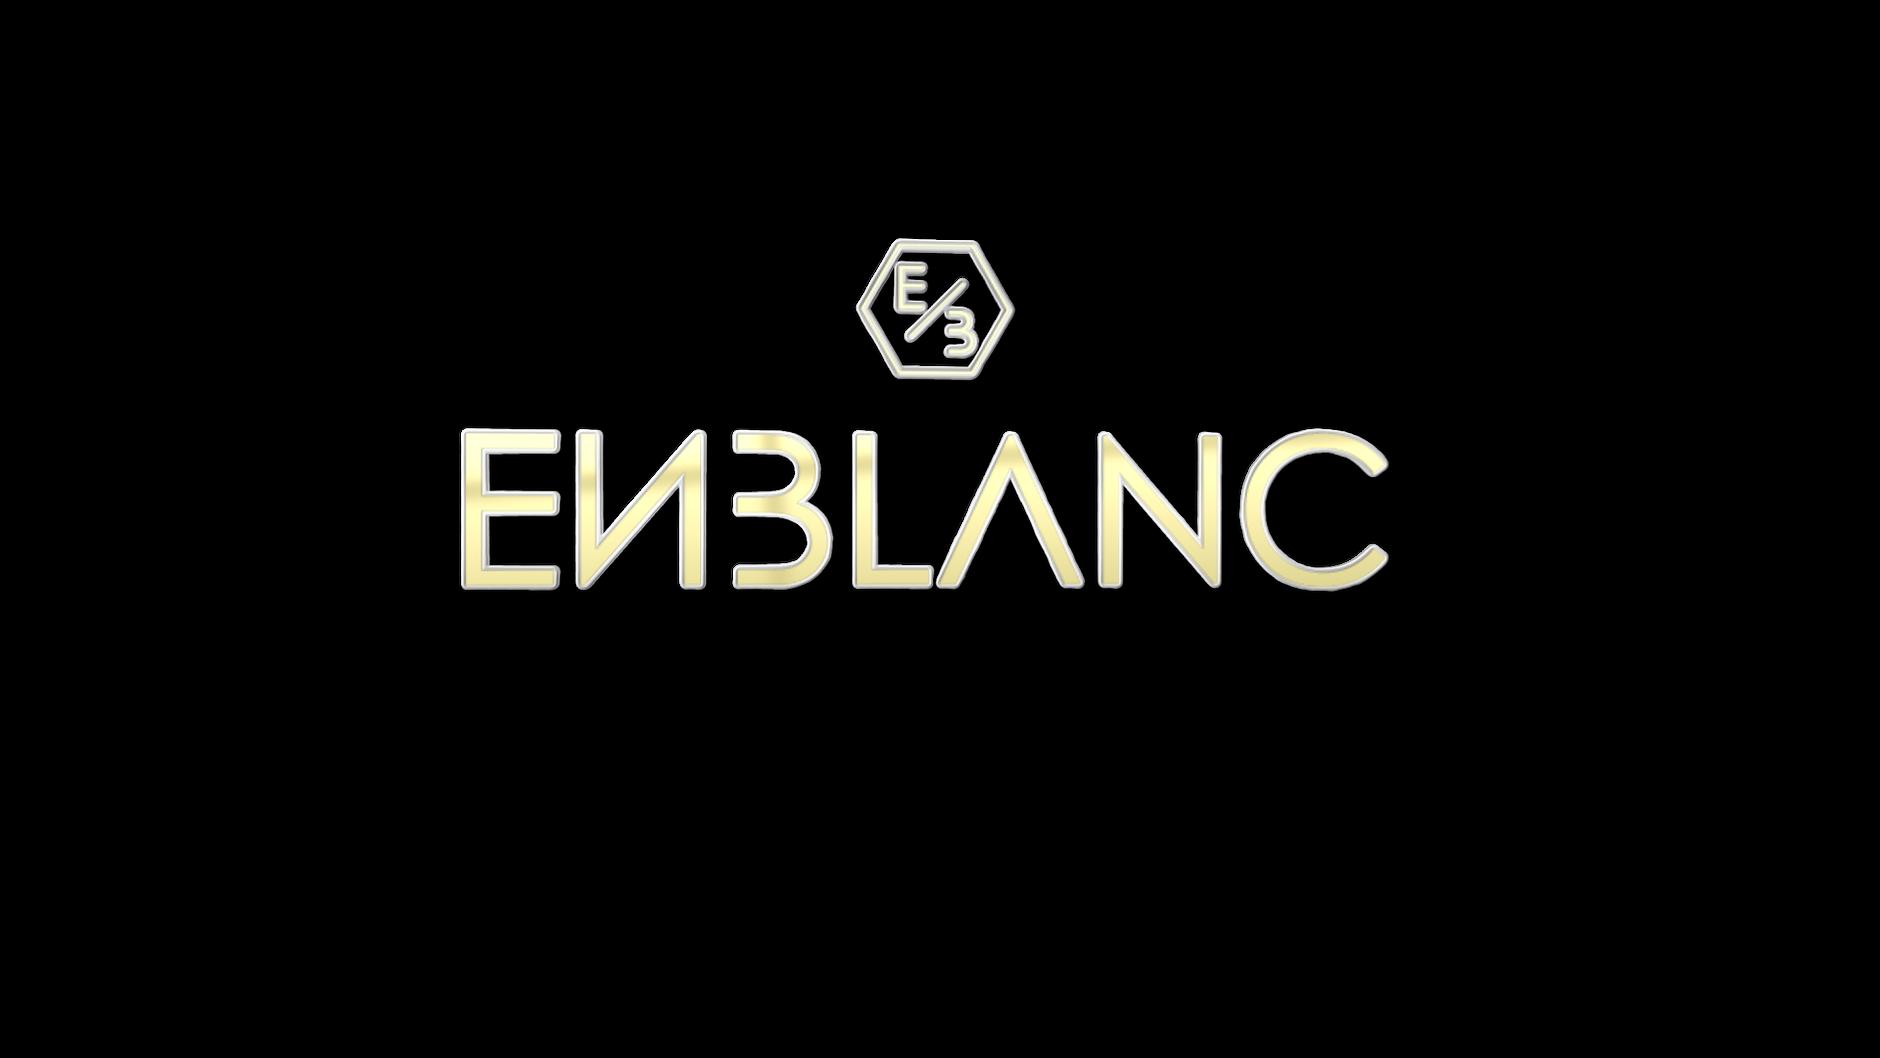 ENBLANC